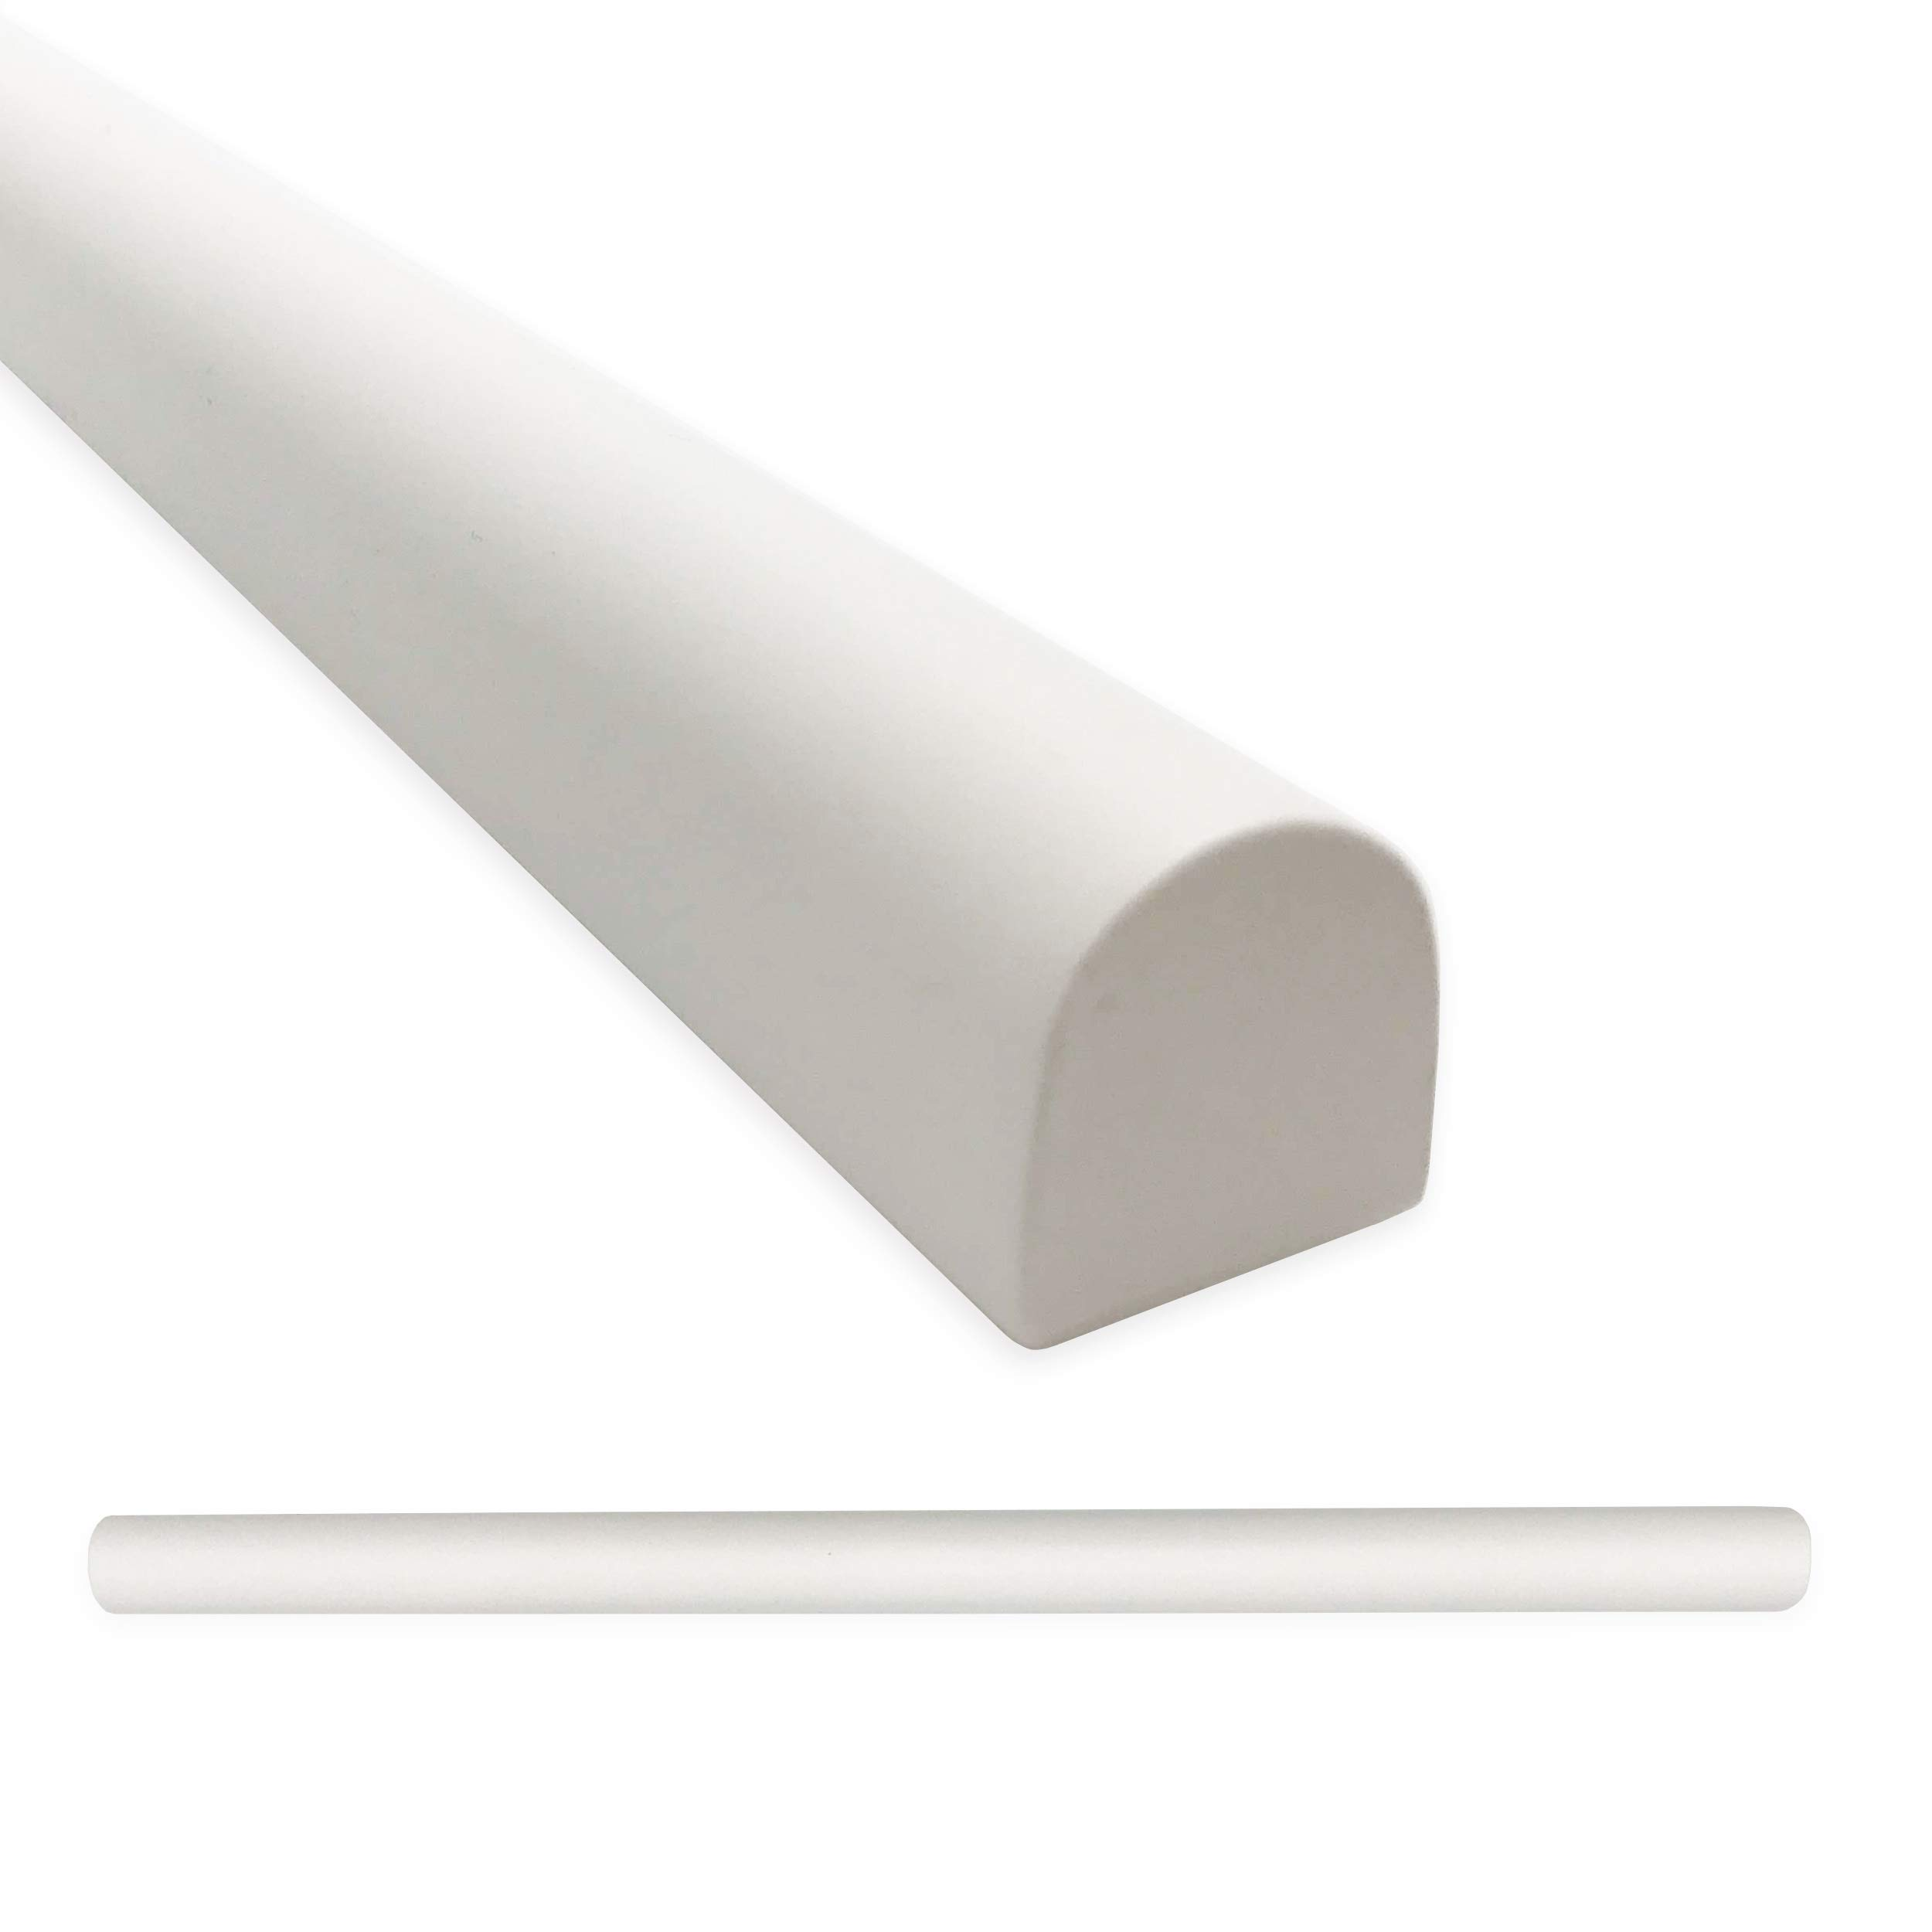 Bright White Soho Bullnose 3/4 X 12 inch Liner Trim 6 Pieces | Molding Tile for Kitchen Bathroom Ceramic Tile Finishing (6 Pack, Matte Bright White)